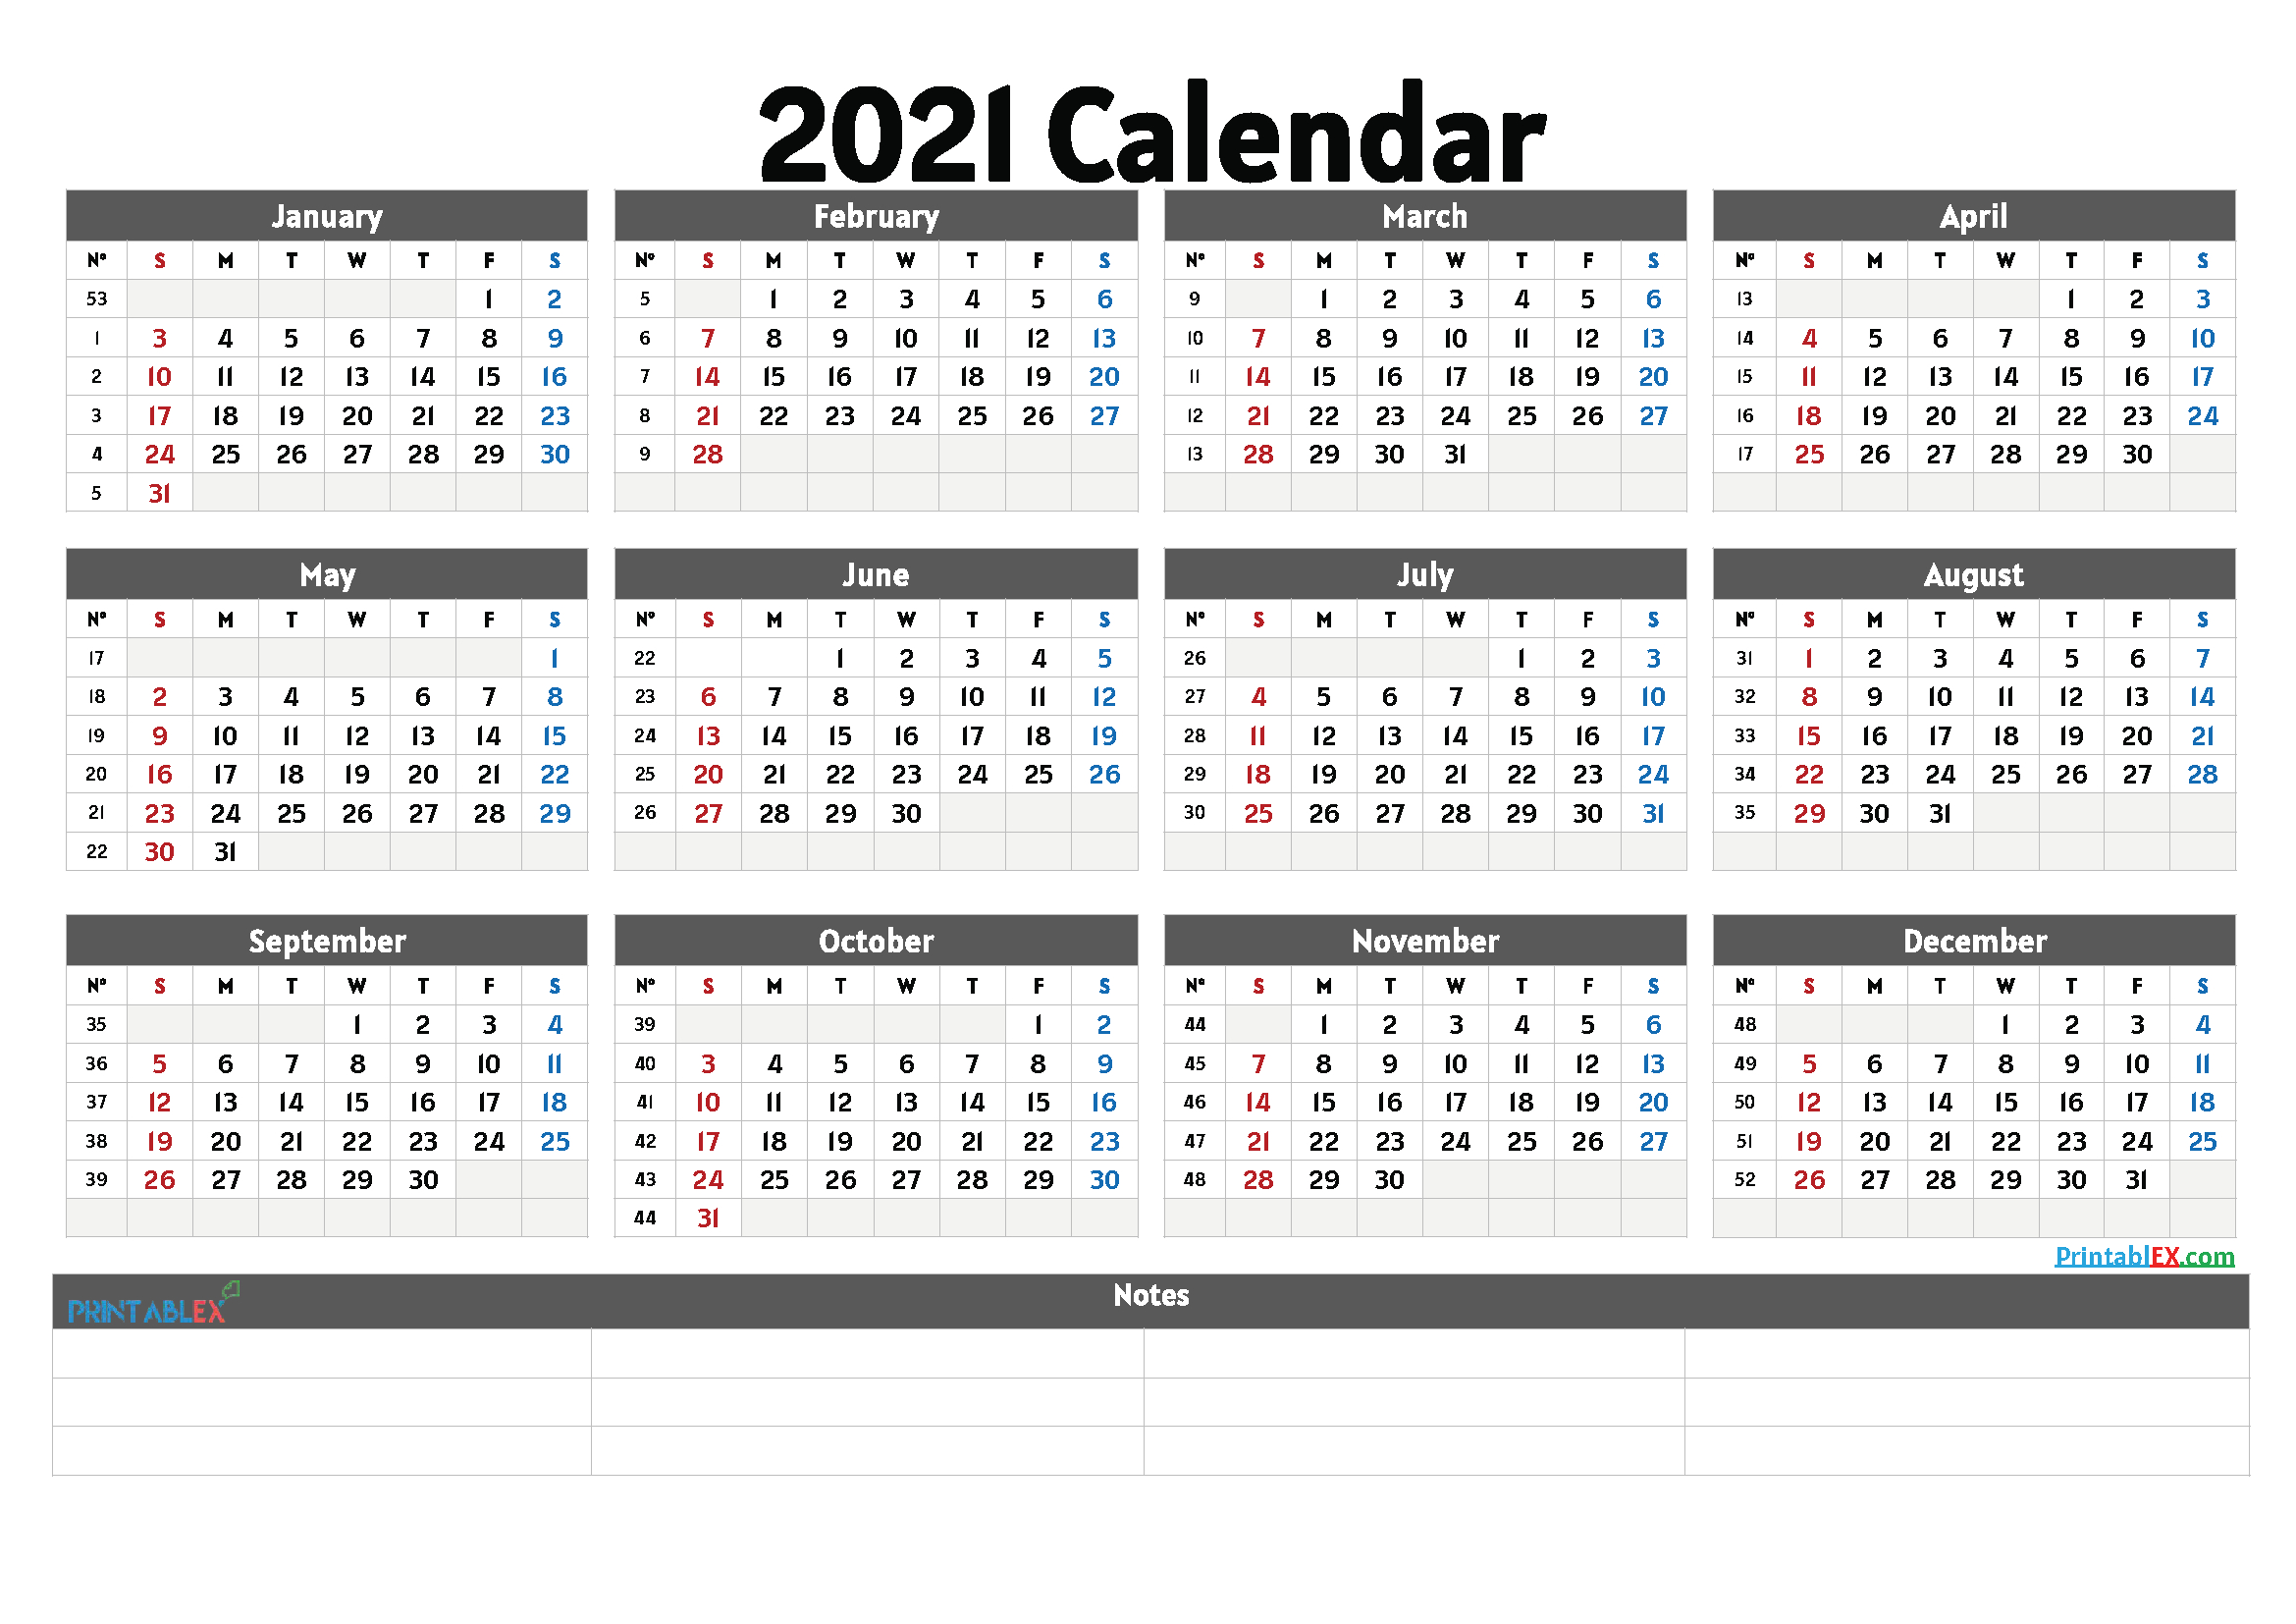 2 Year Annual Calendar Printable 2020 And 2021 | Printable-2 Page Printable Yearly Calendar Template 2021